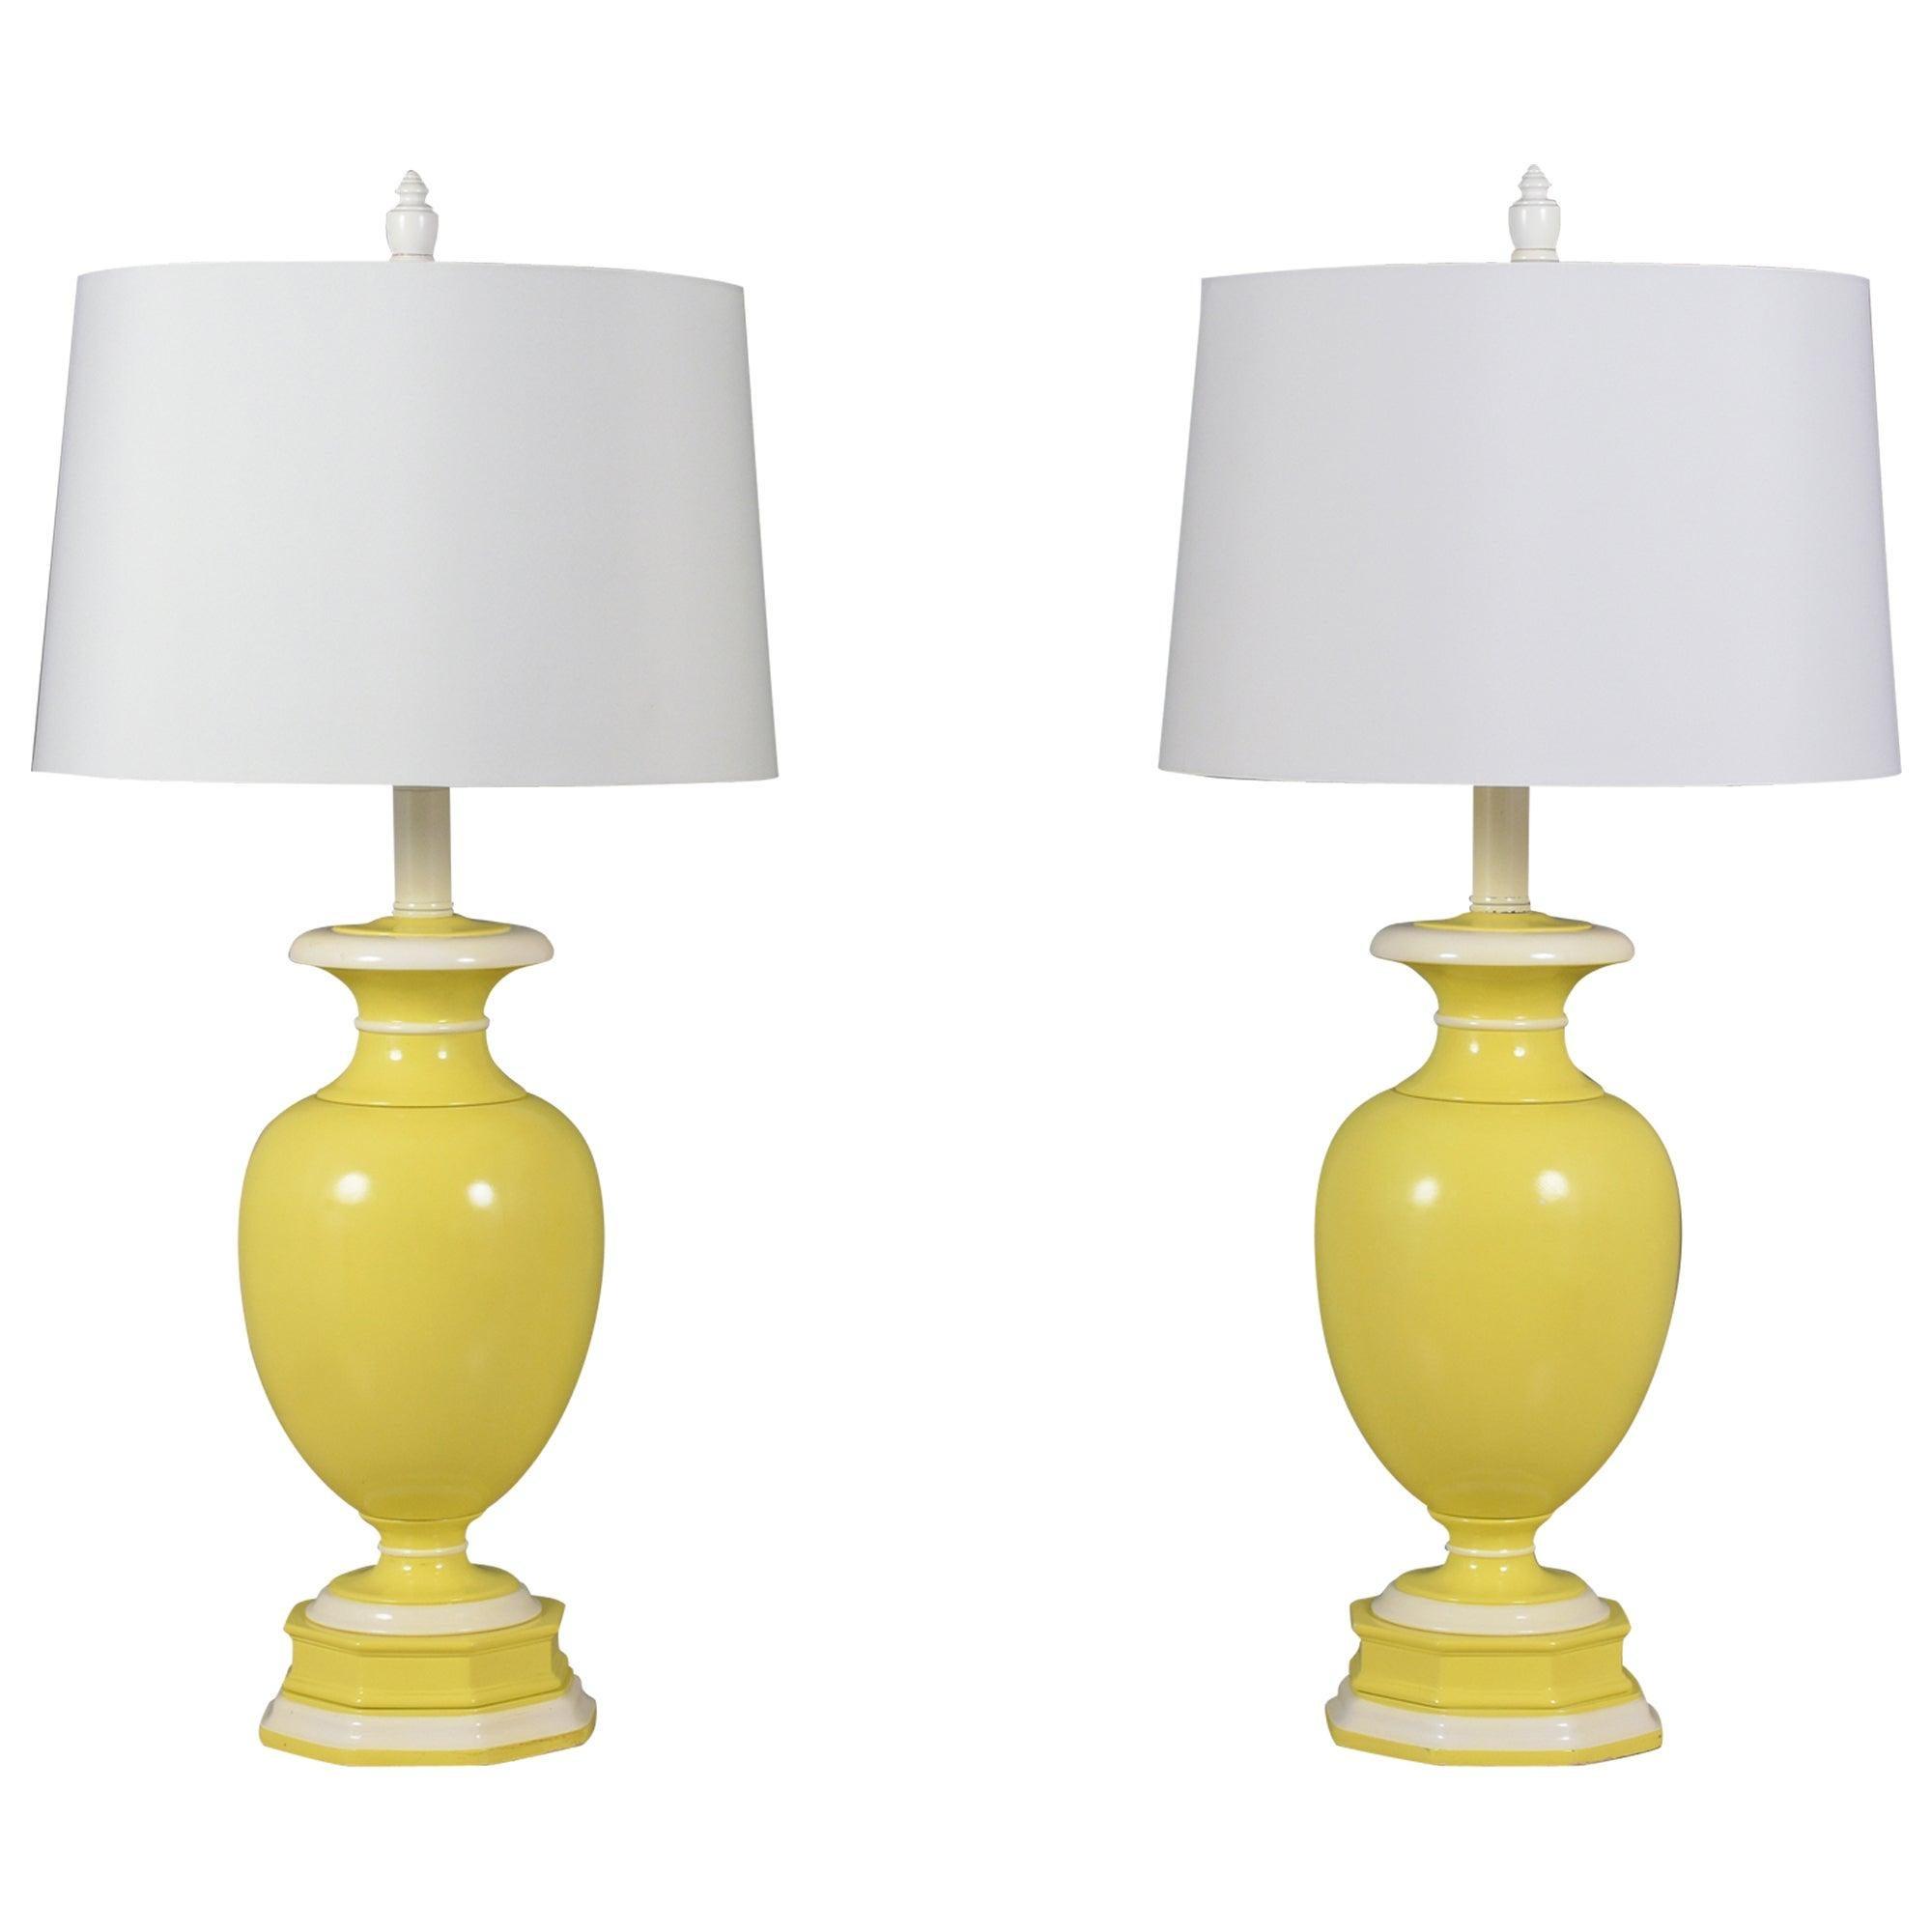 Pair of Neoclassic Ceramic Table Lamps